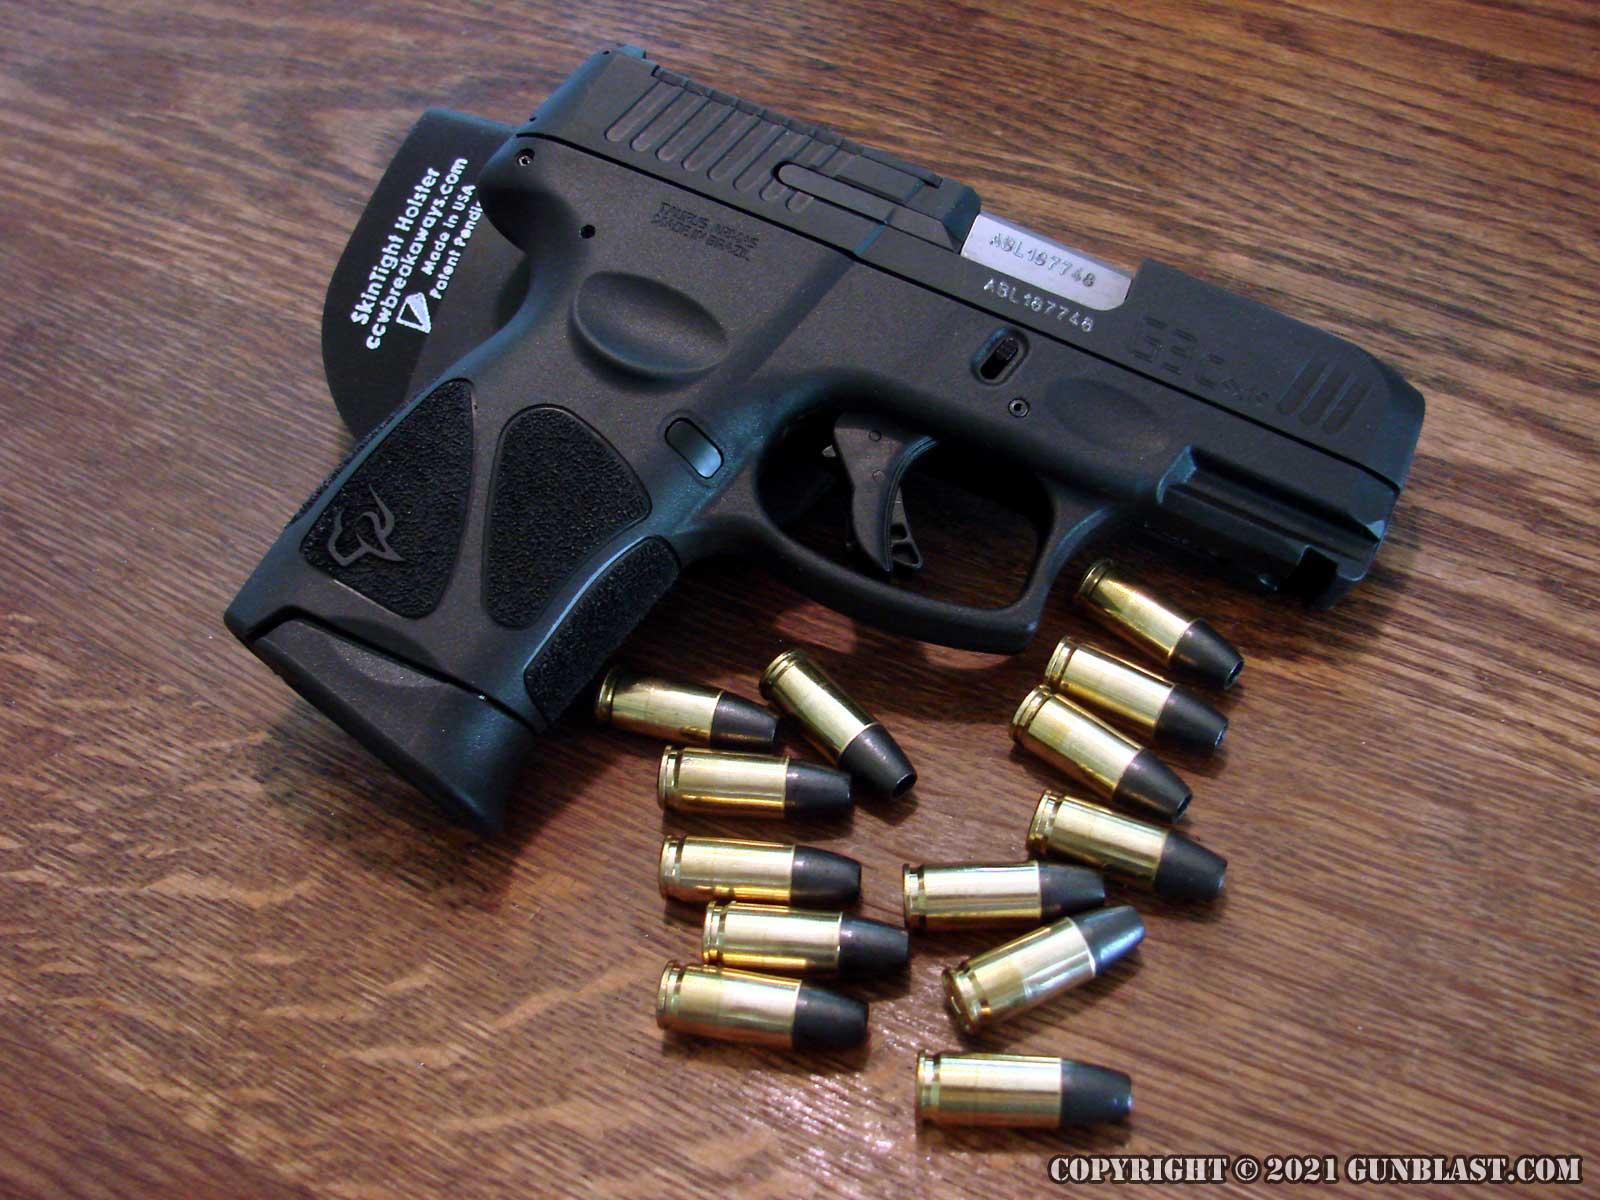 Gunblast.com Reviews the Taurus G3C!